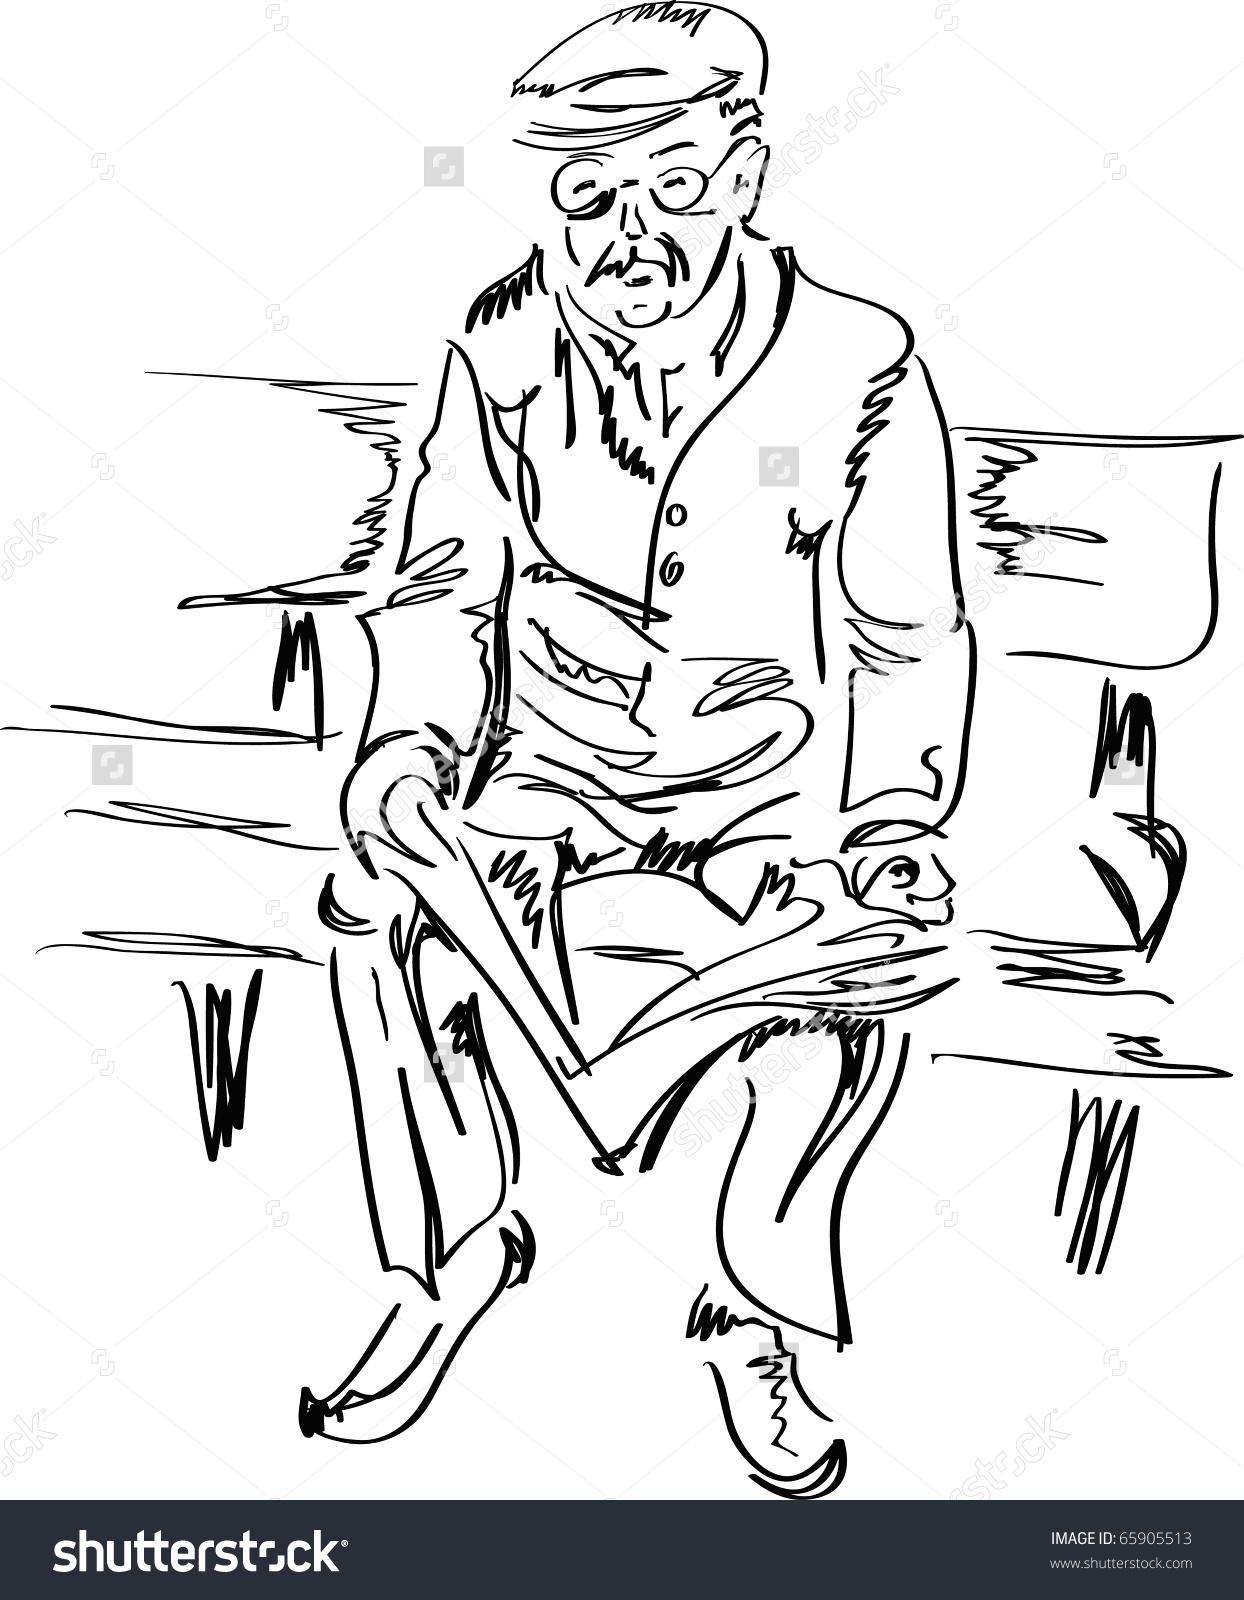 Old Man Reading Newspaper Sketch Vector Stock Vector 65905513.